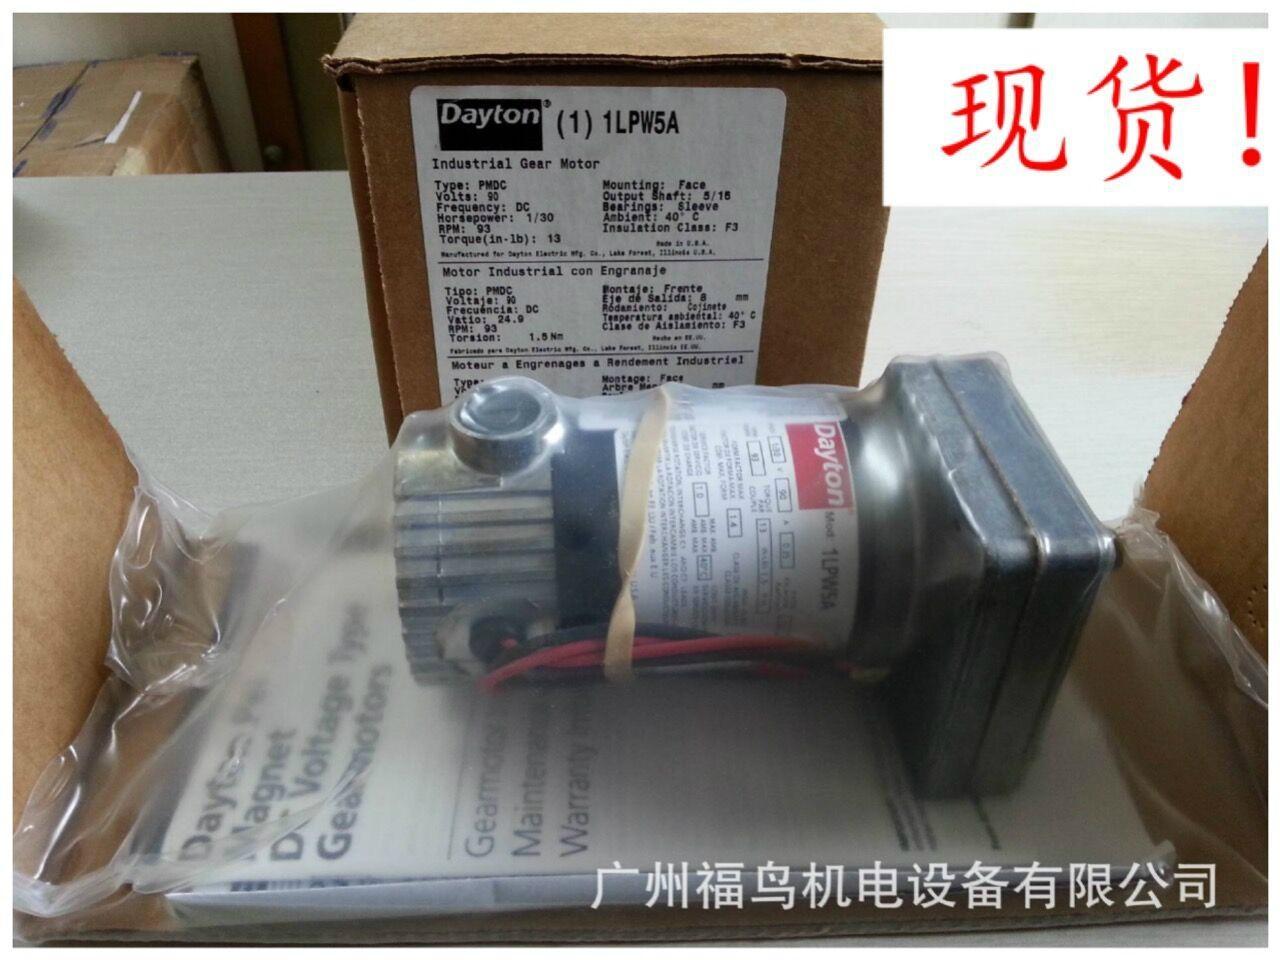 DAYTON電機, 現貨型號: 1LPW5A, 1LPW5